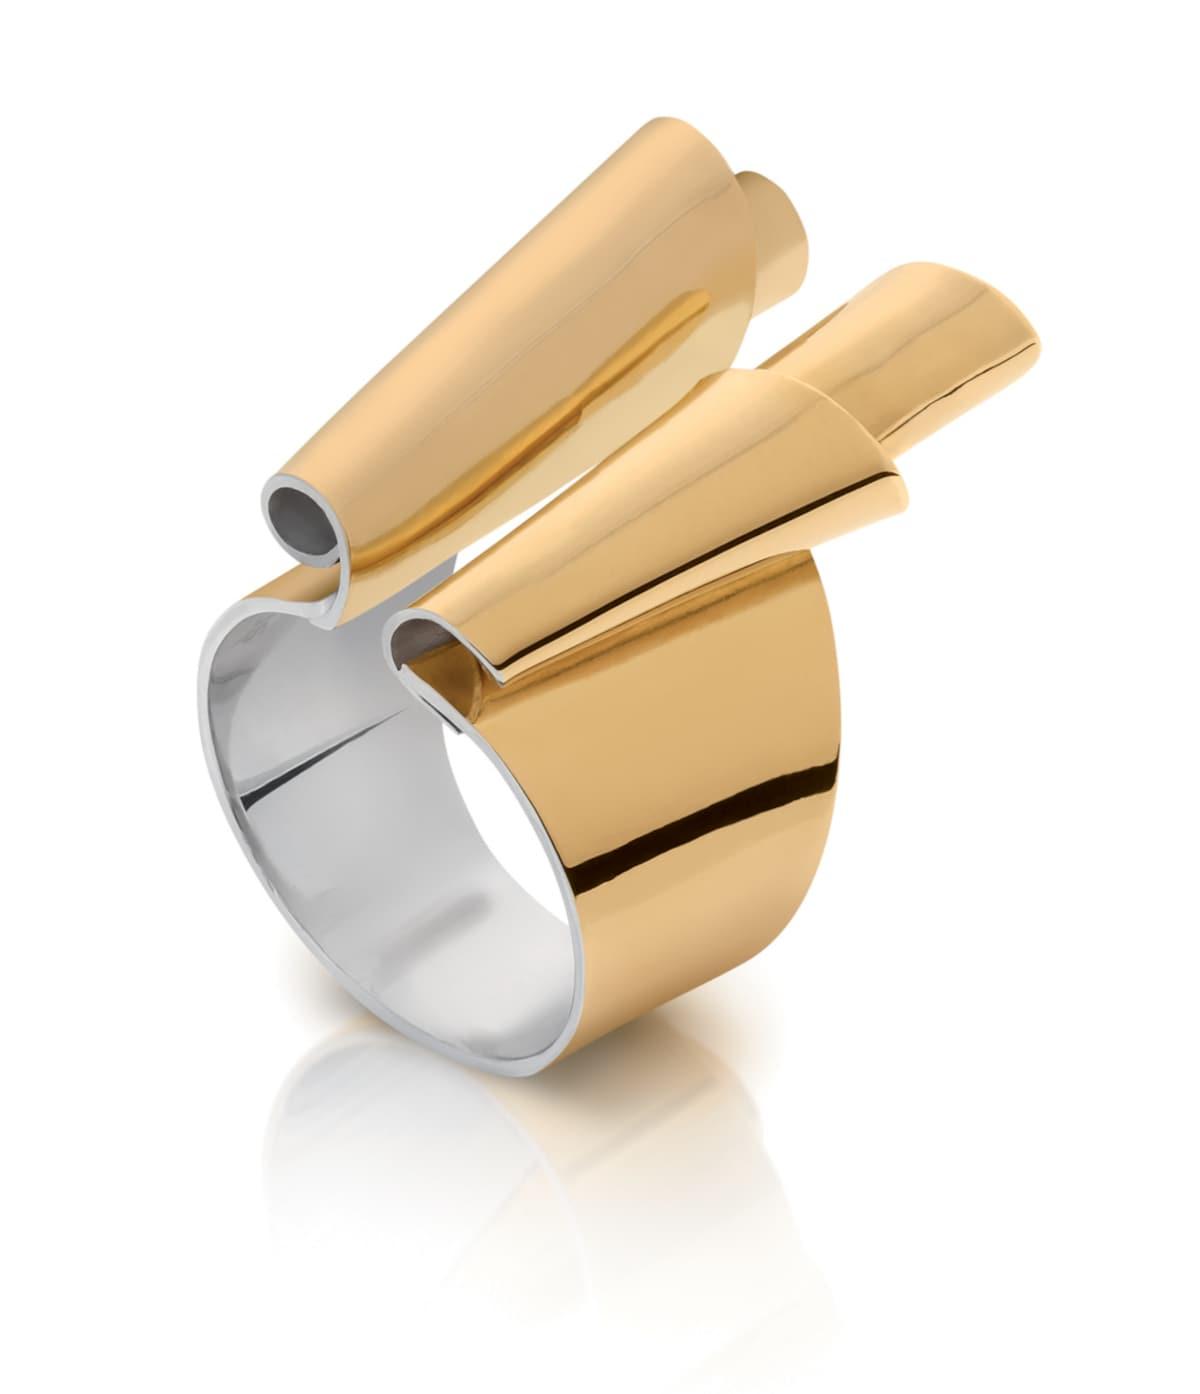 Gold and Silver Rita Ring